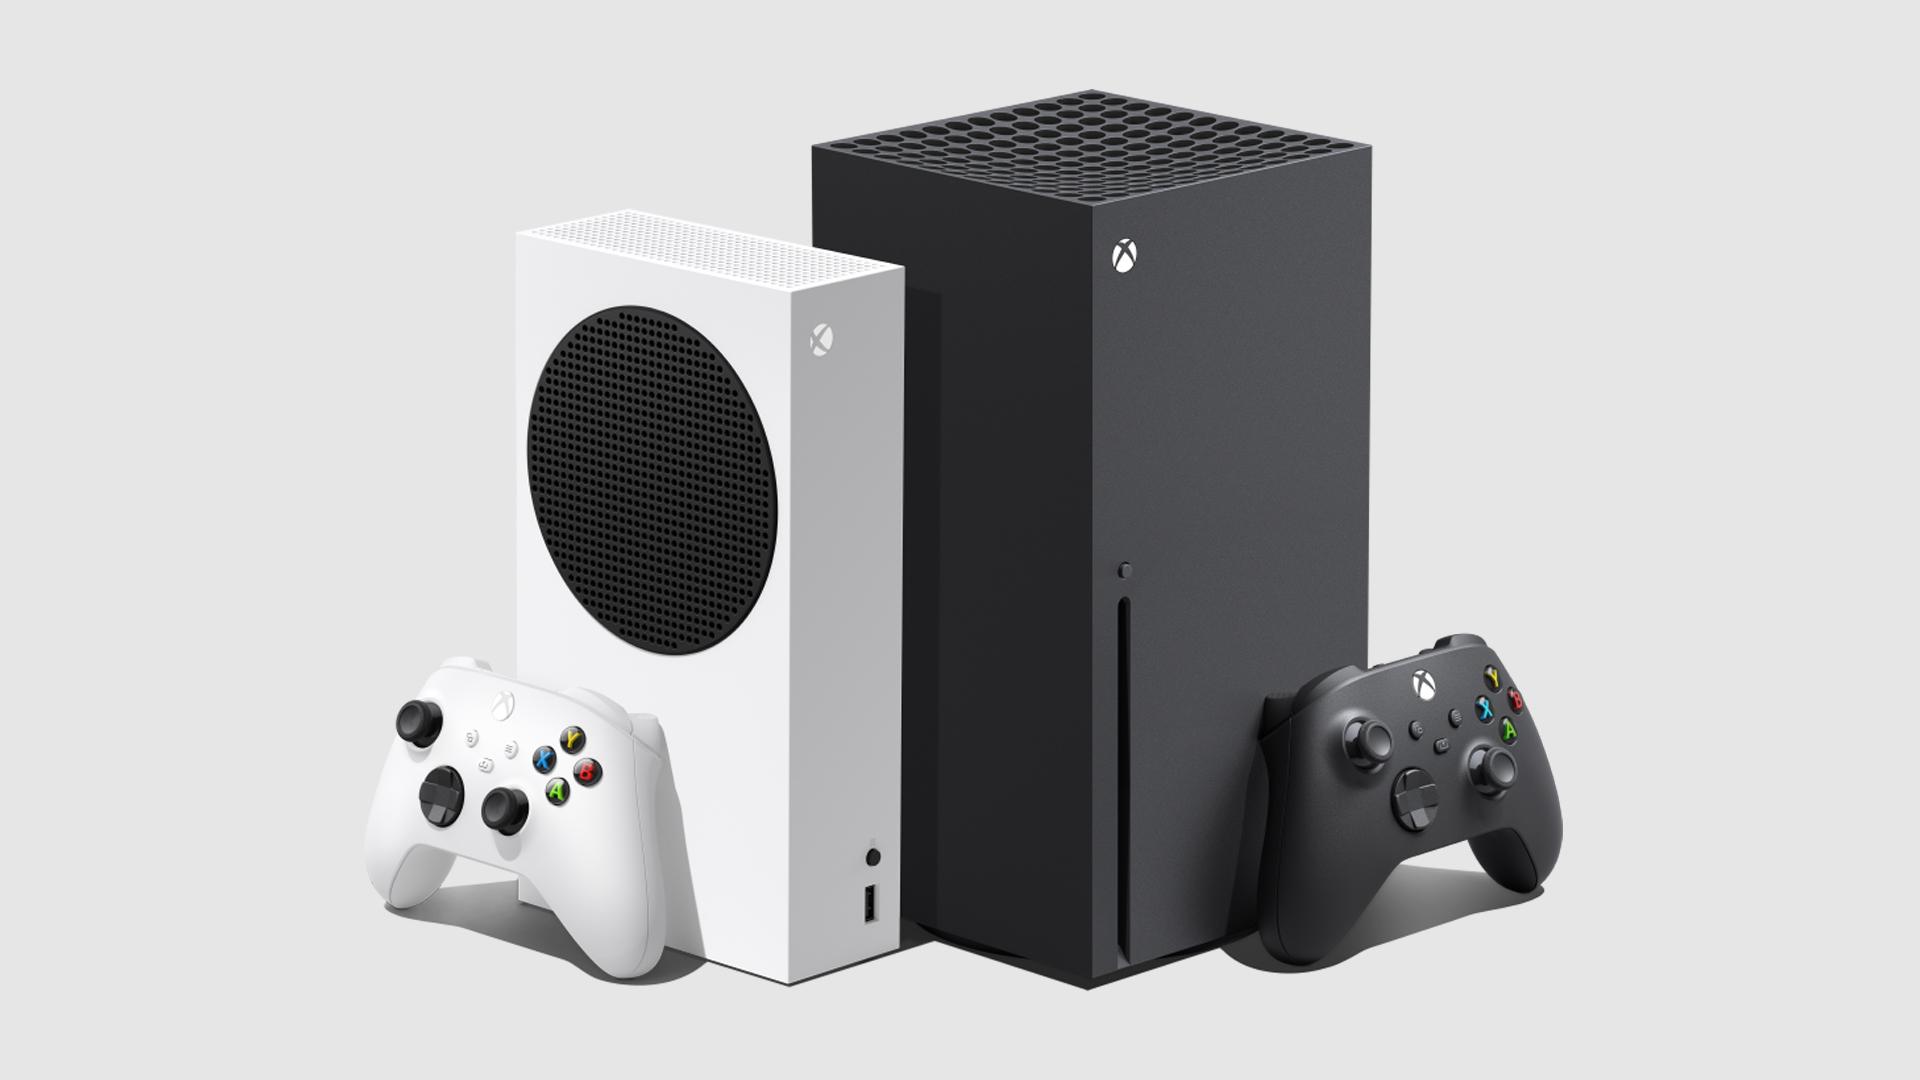 Where To Buy Xbox Series X All The Latest Stock Updates Techradar